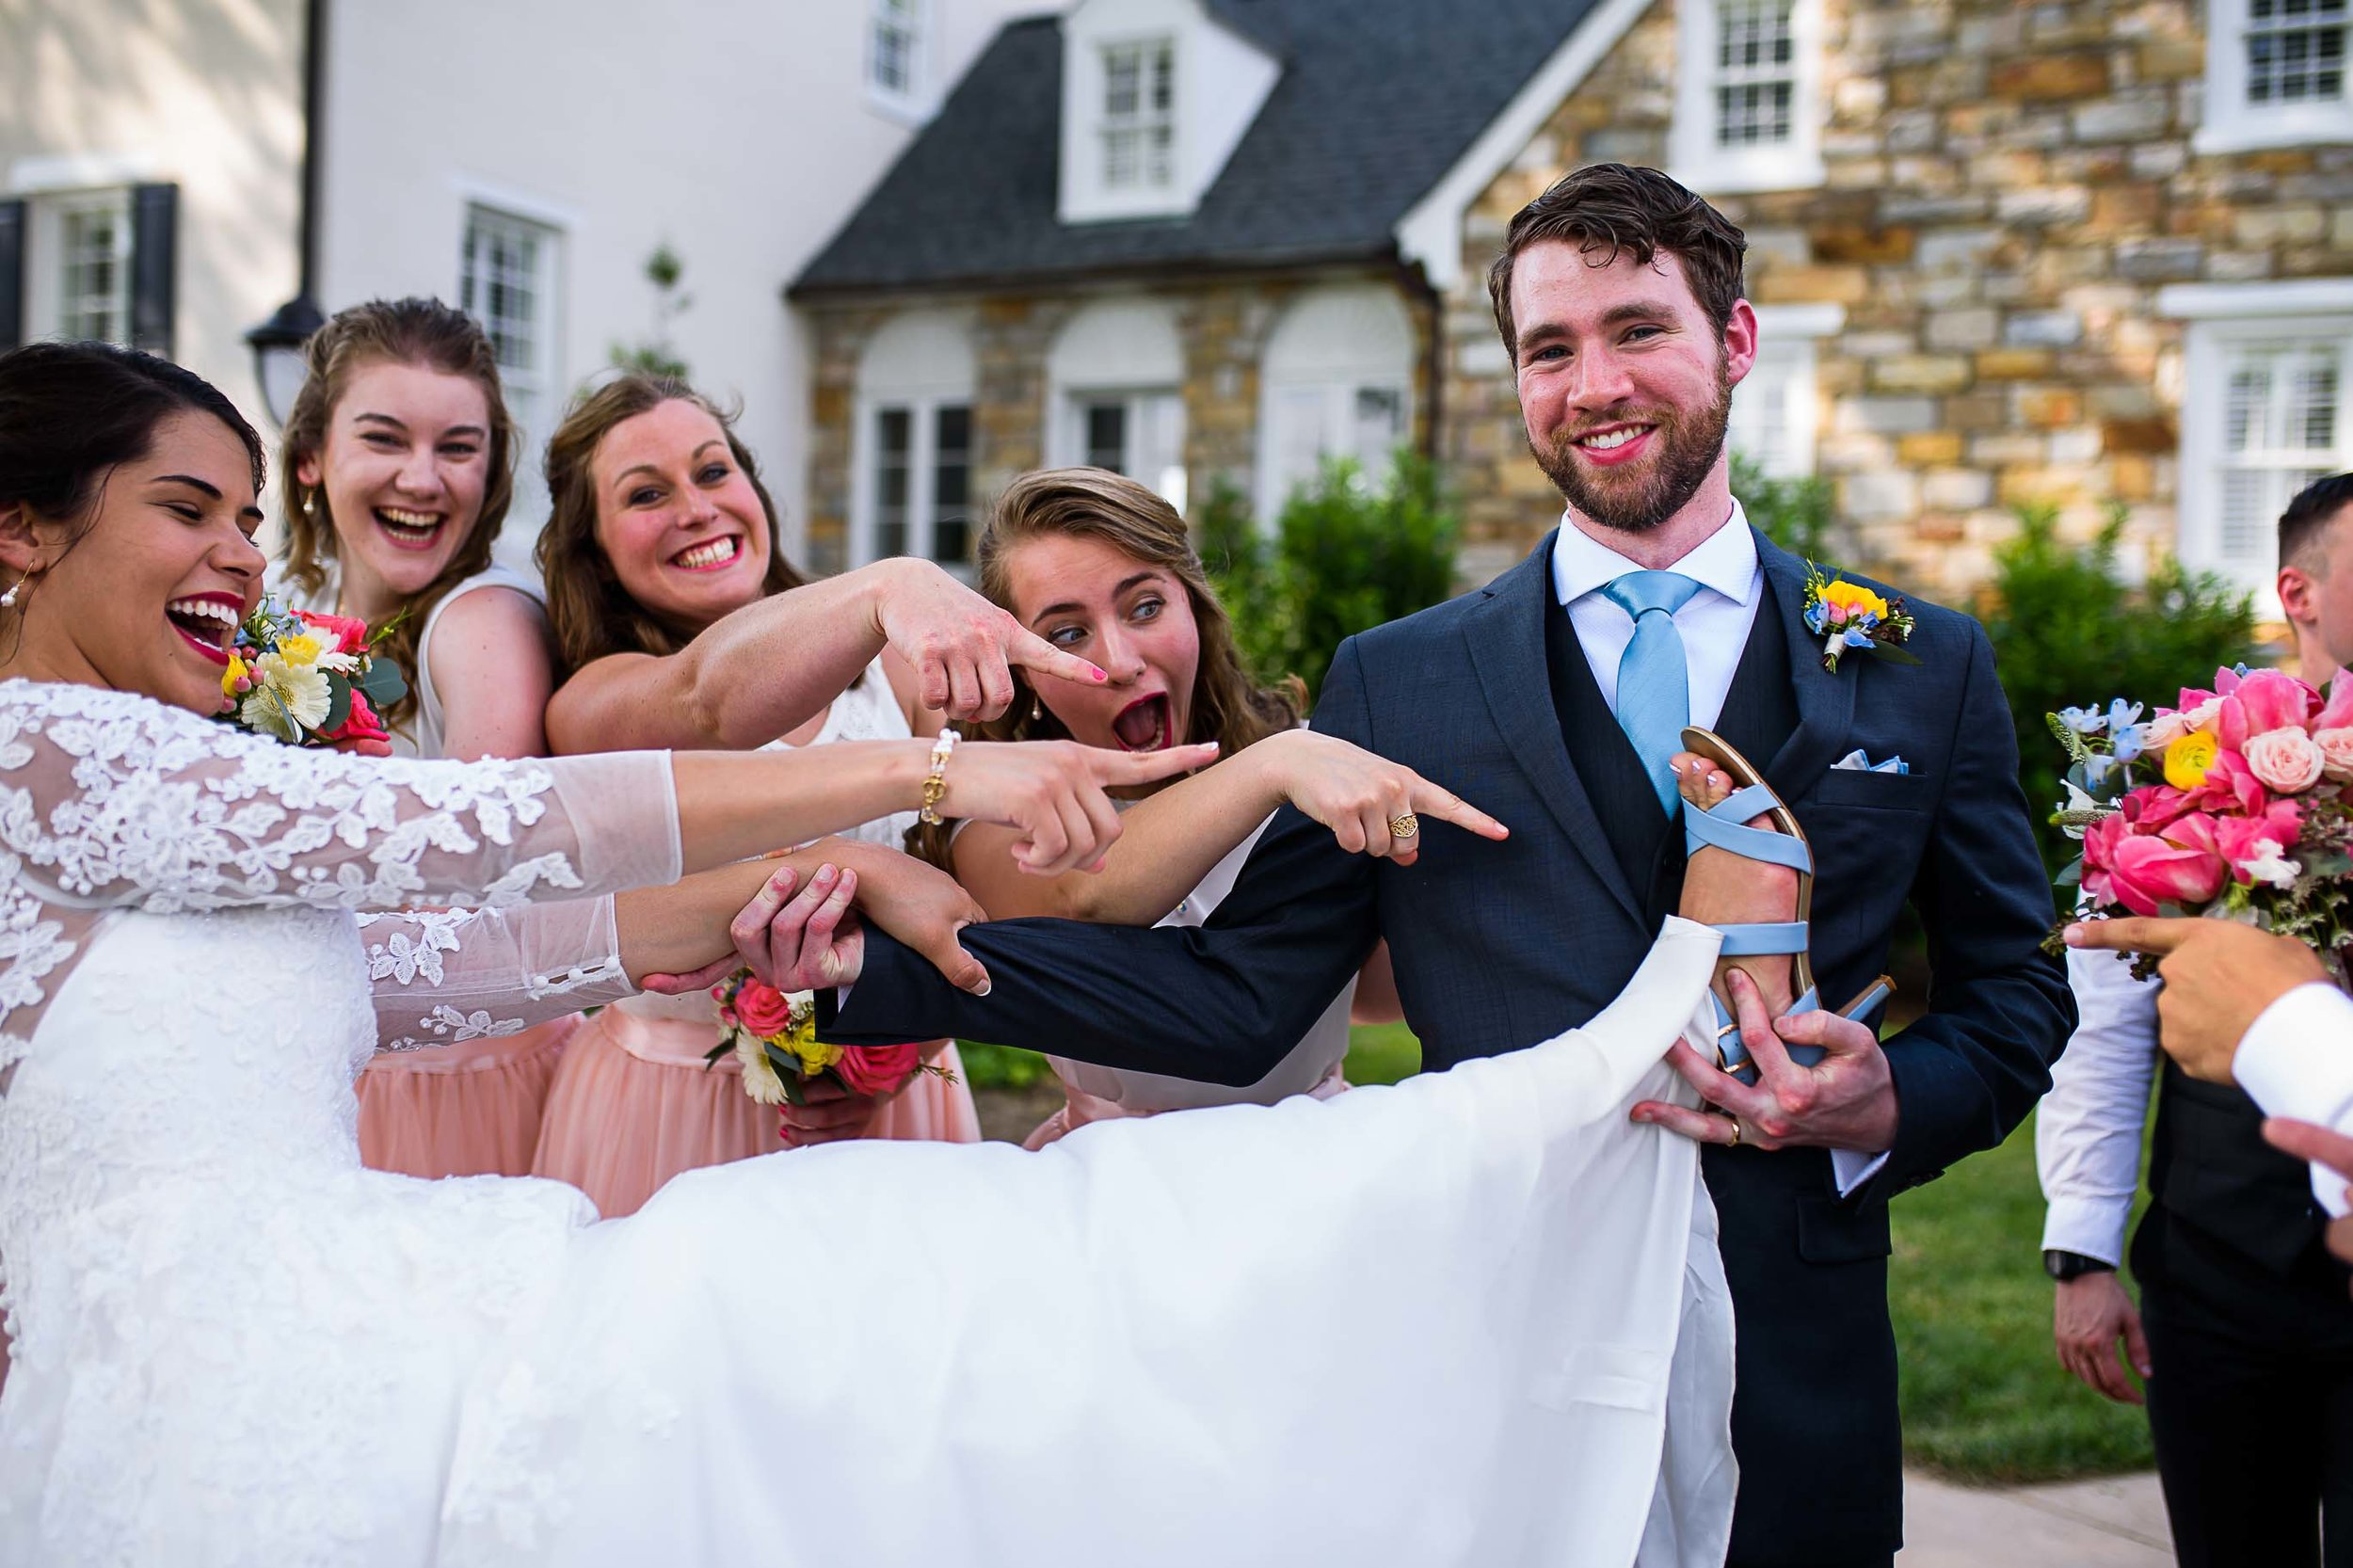 Evergreen Country Club wedding photos53.jpg